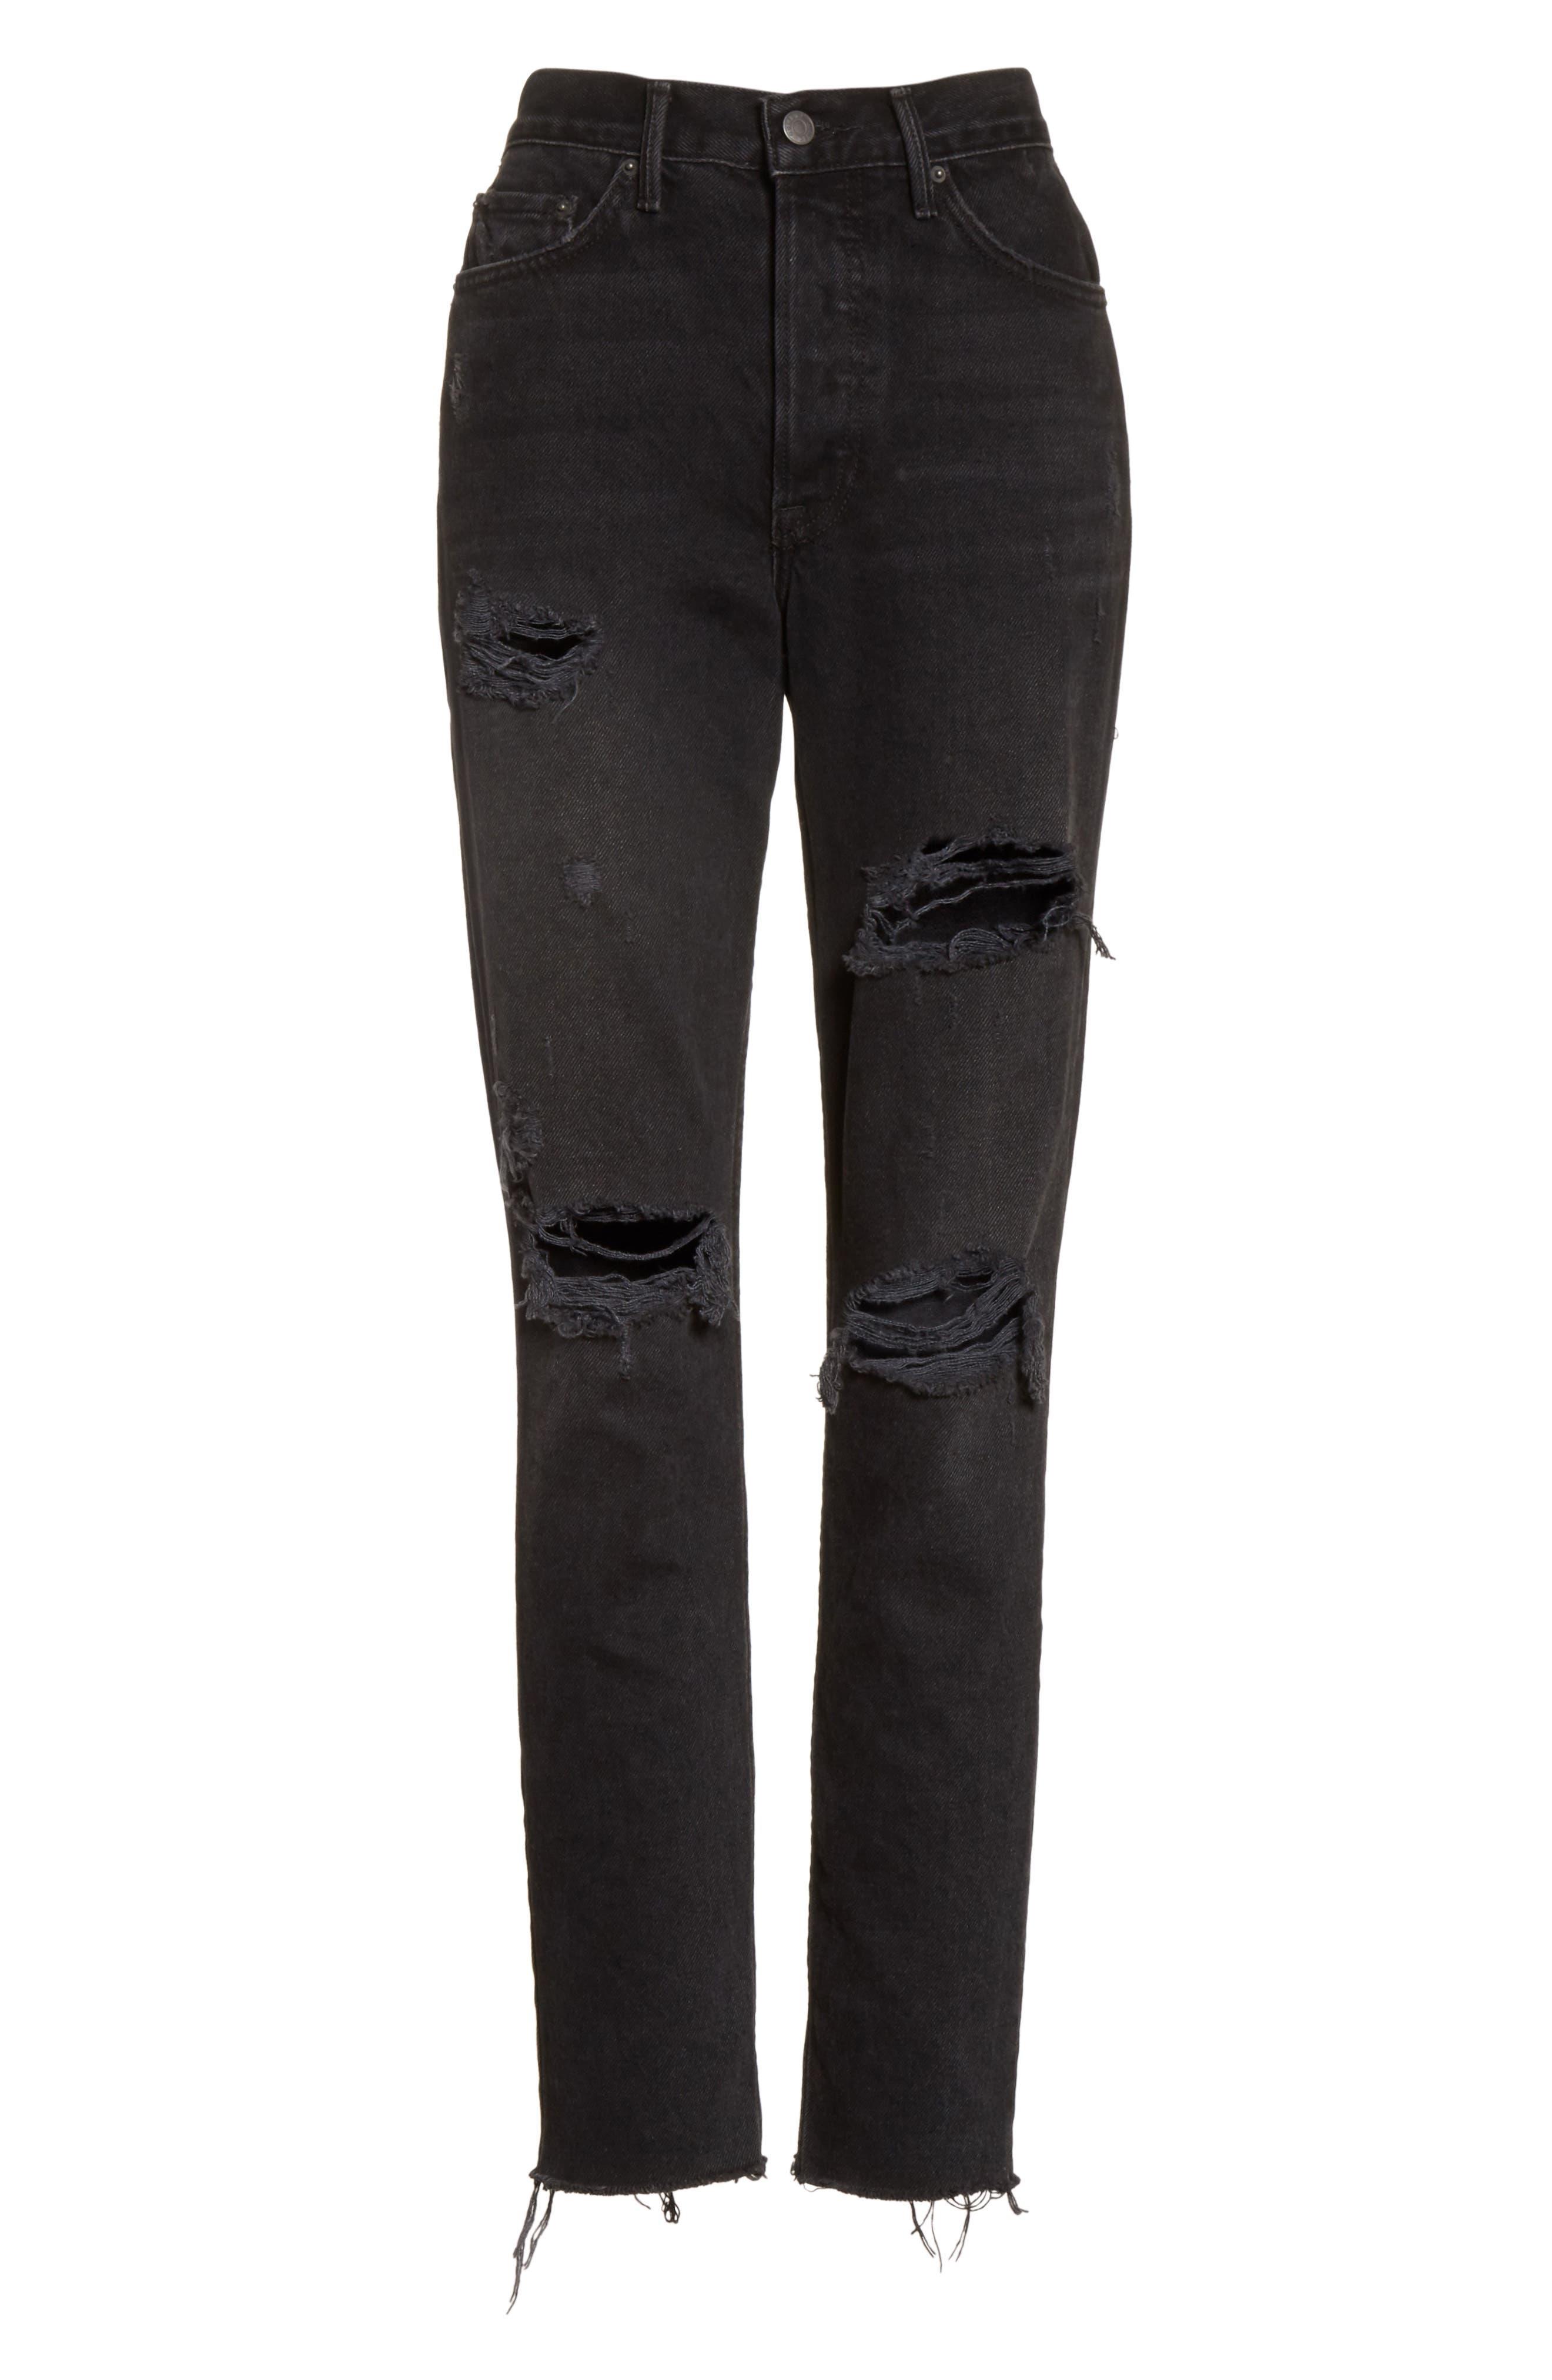 Karolina Ripped Rigid High Waist Skinny Jeans,                             Alternate thumbnail 6, color,                             TRAVELIN BAND